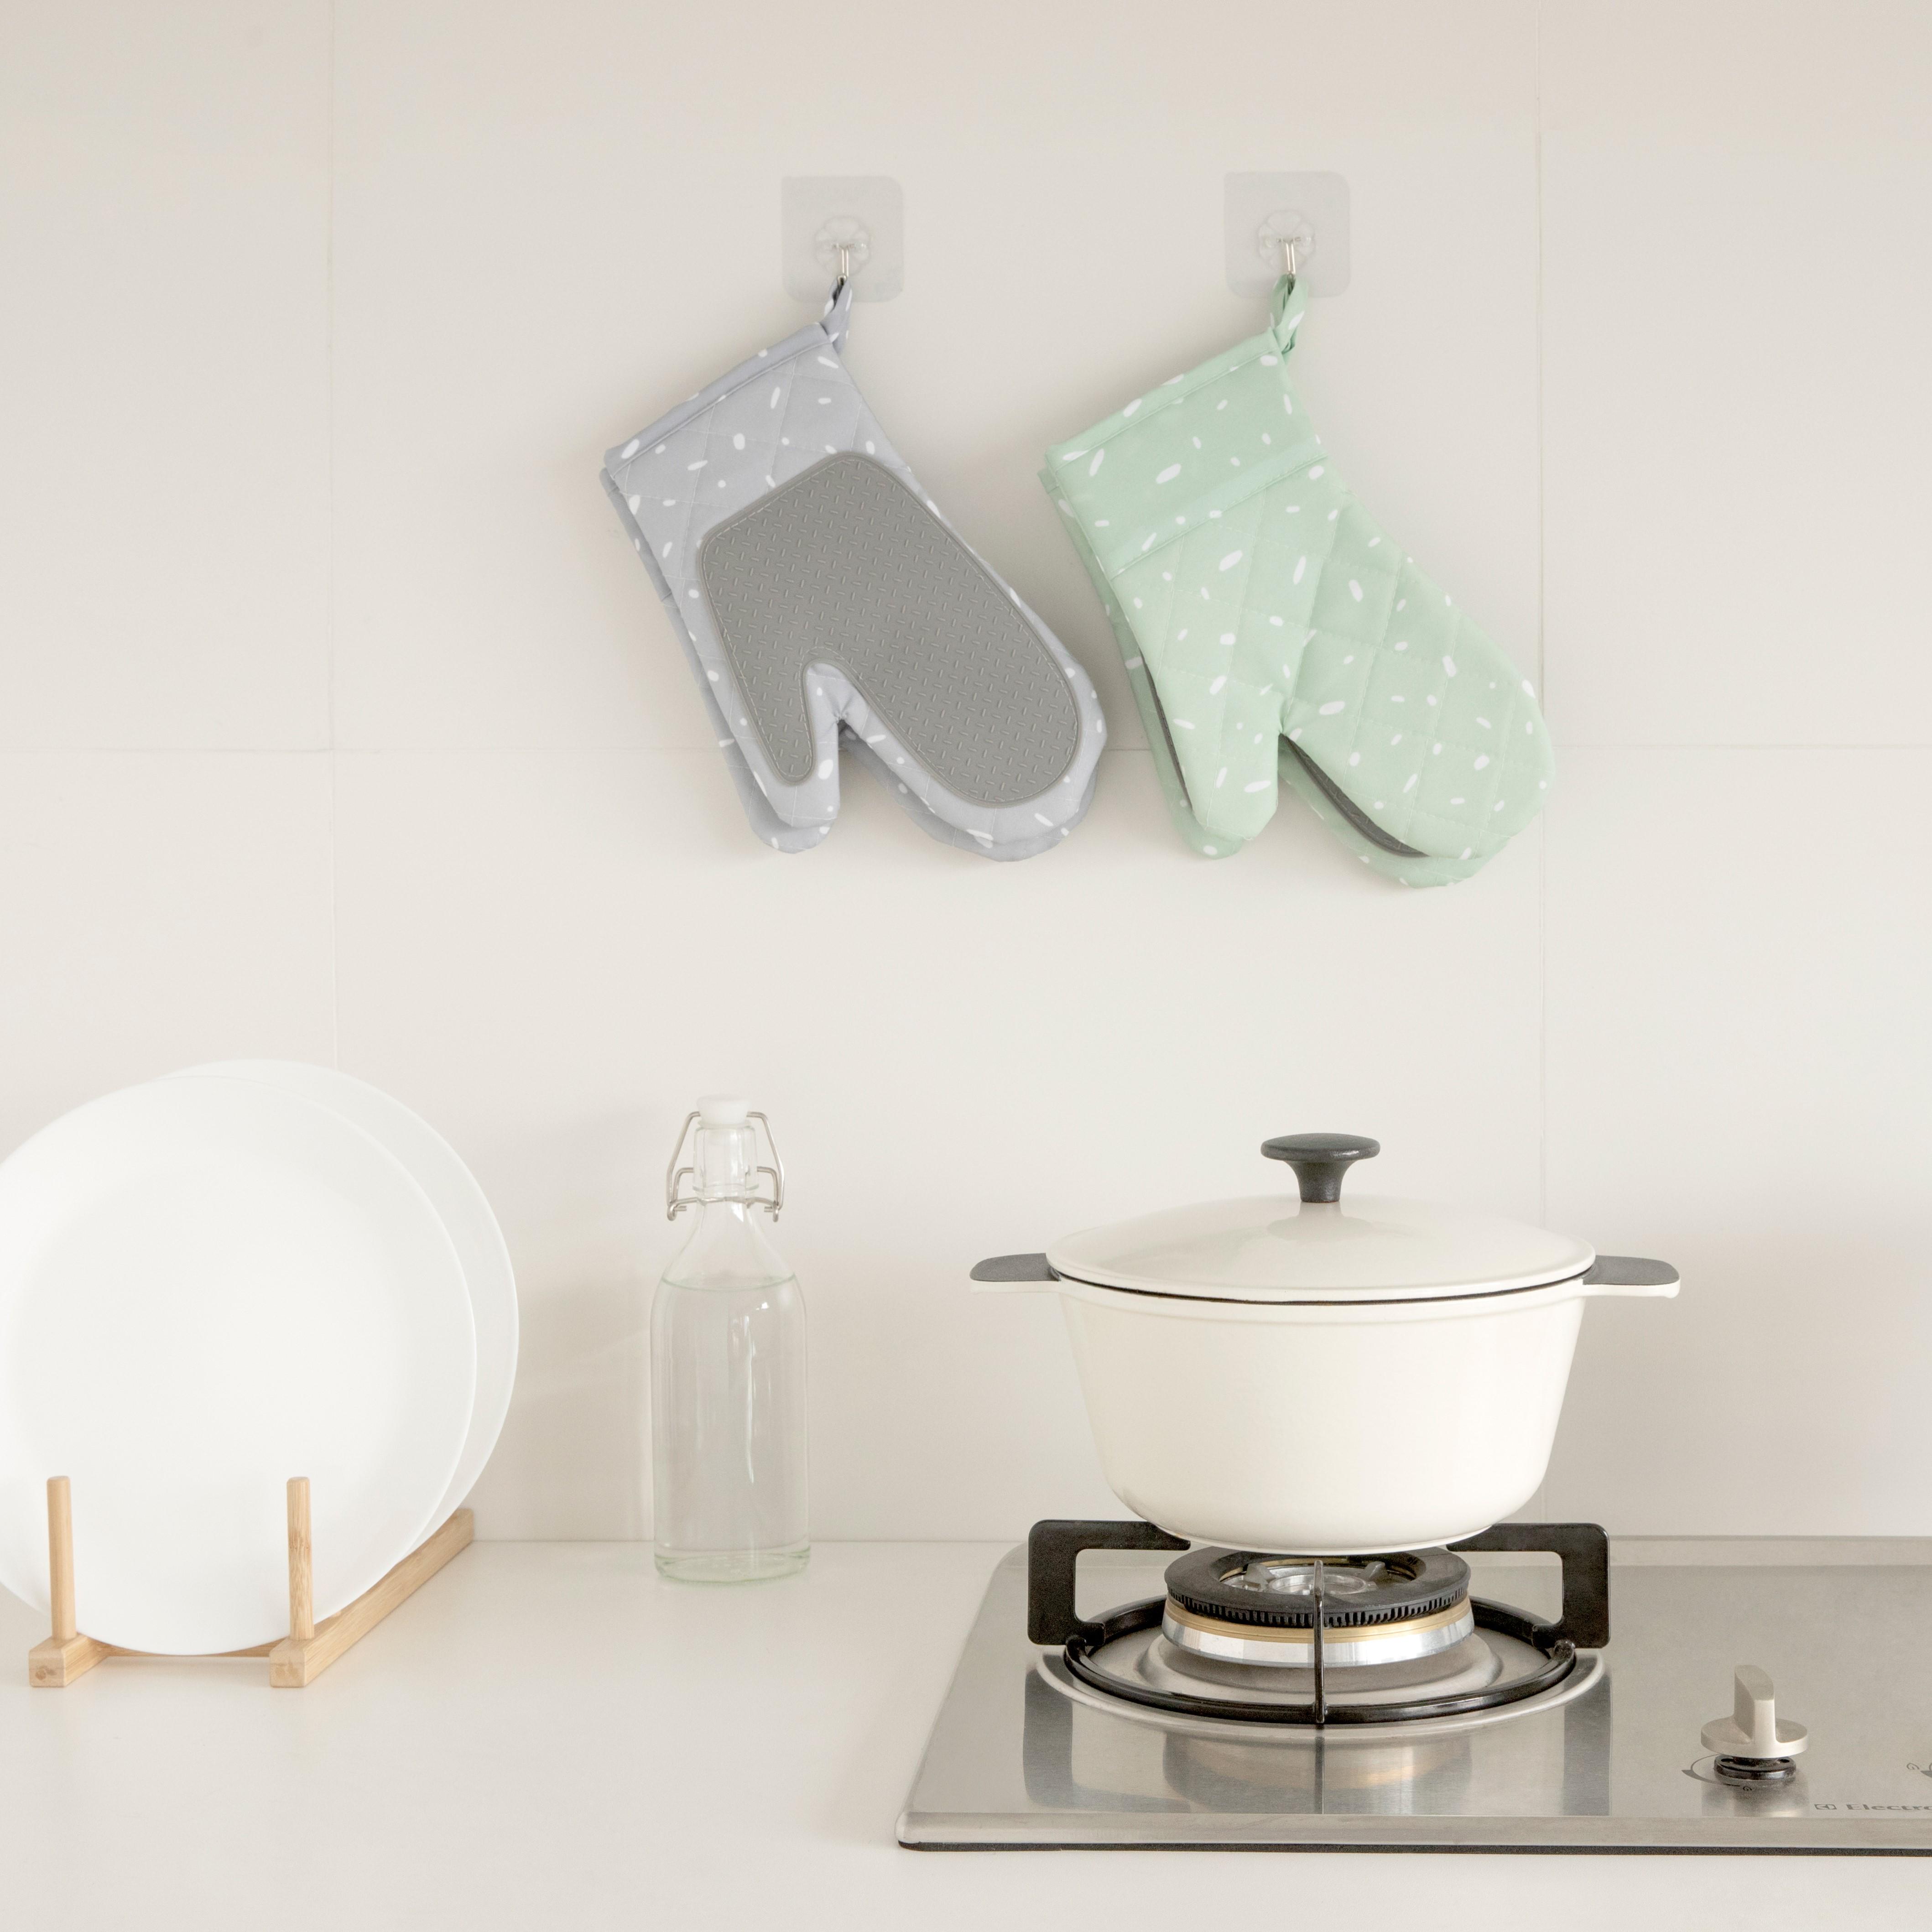 kitchen tools cooking double oven mitt glove colorful oven glove kitchen baking gloves oven mitts